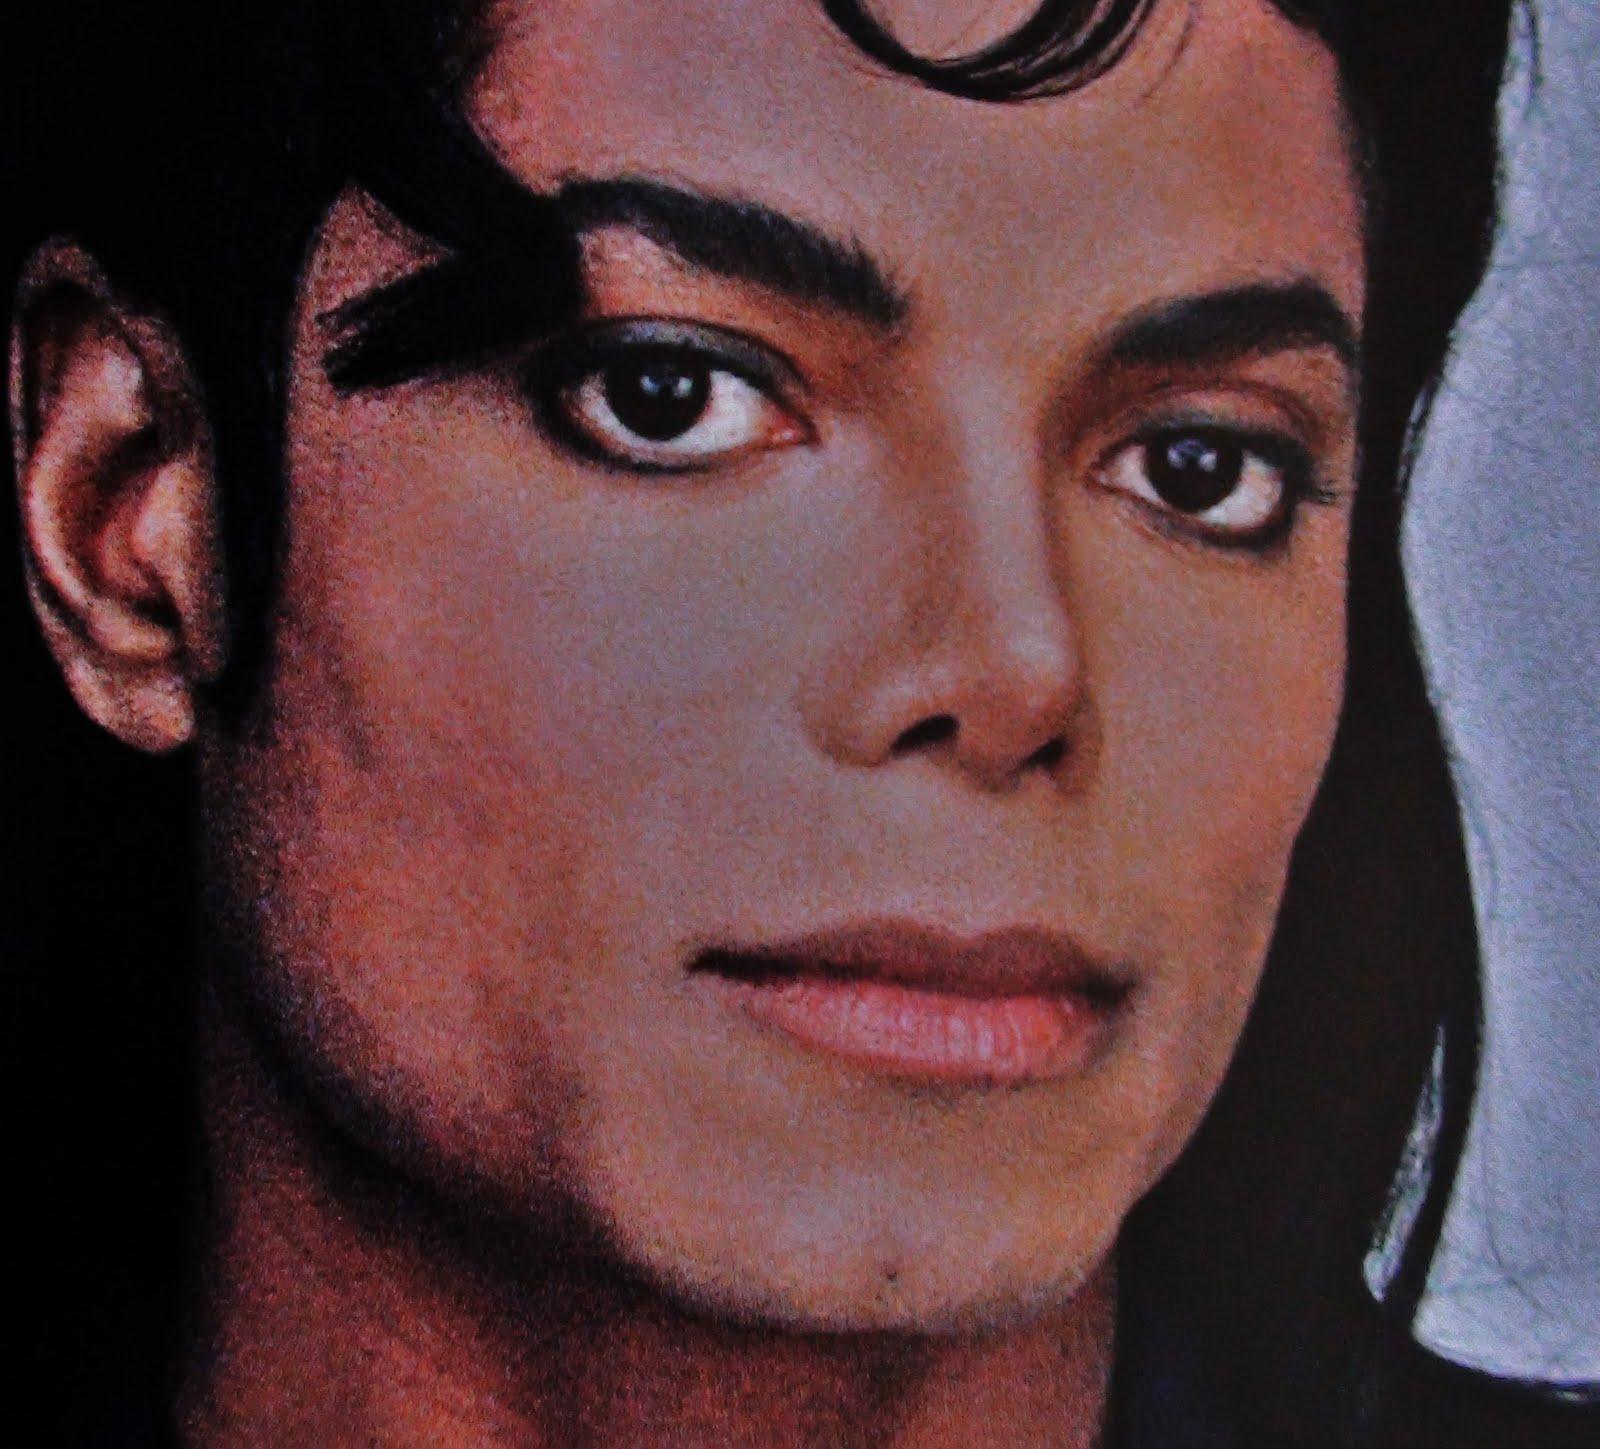 Wallpaper Hd King Cat Love Michael Jackson Wallpaper